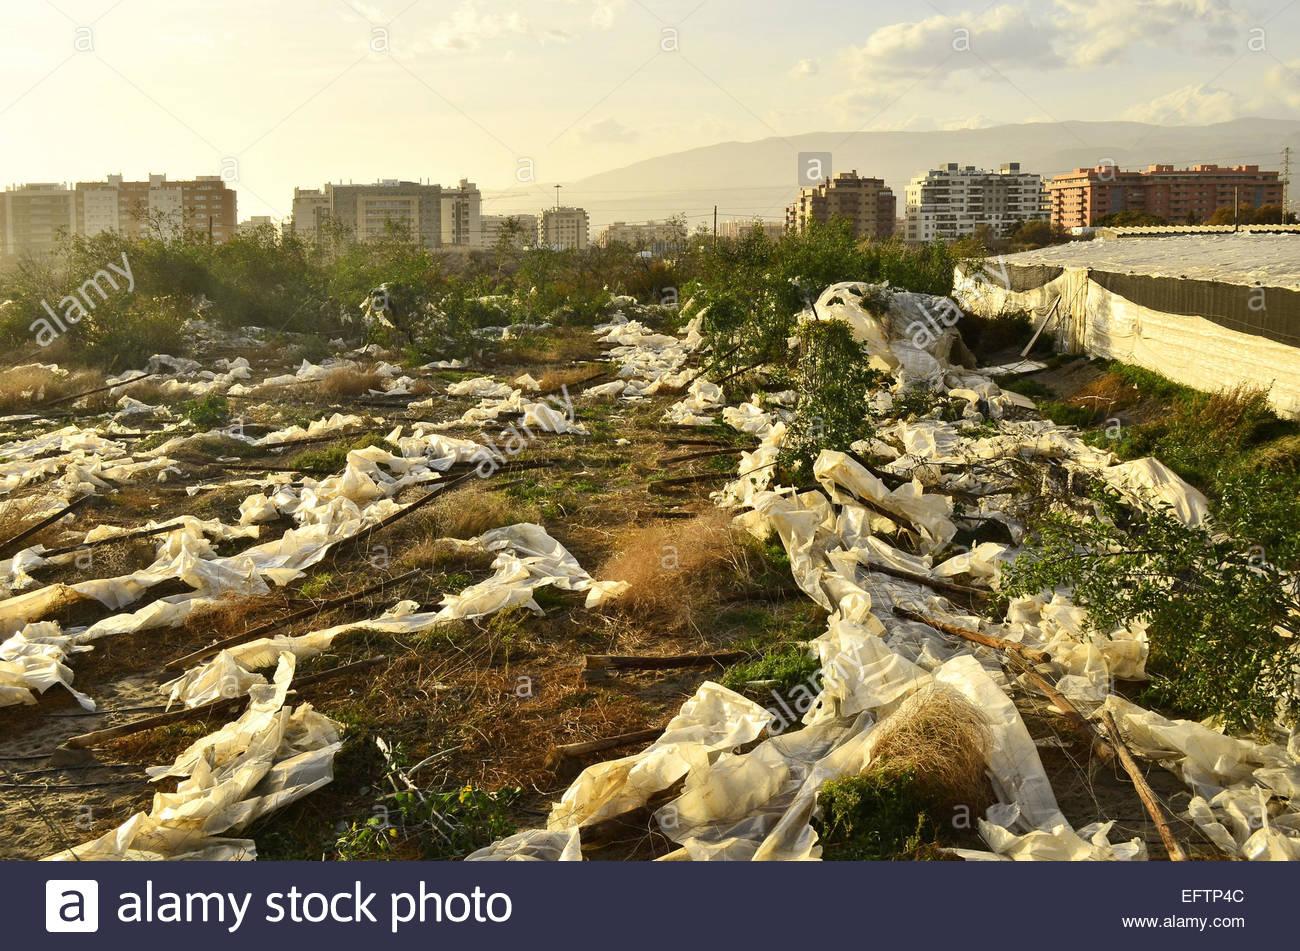 Les serres de plastique pollution des sols La contamination, Almeria Espagne du sud Europe Photo Stock